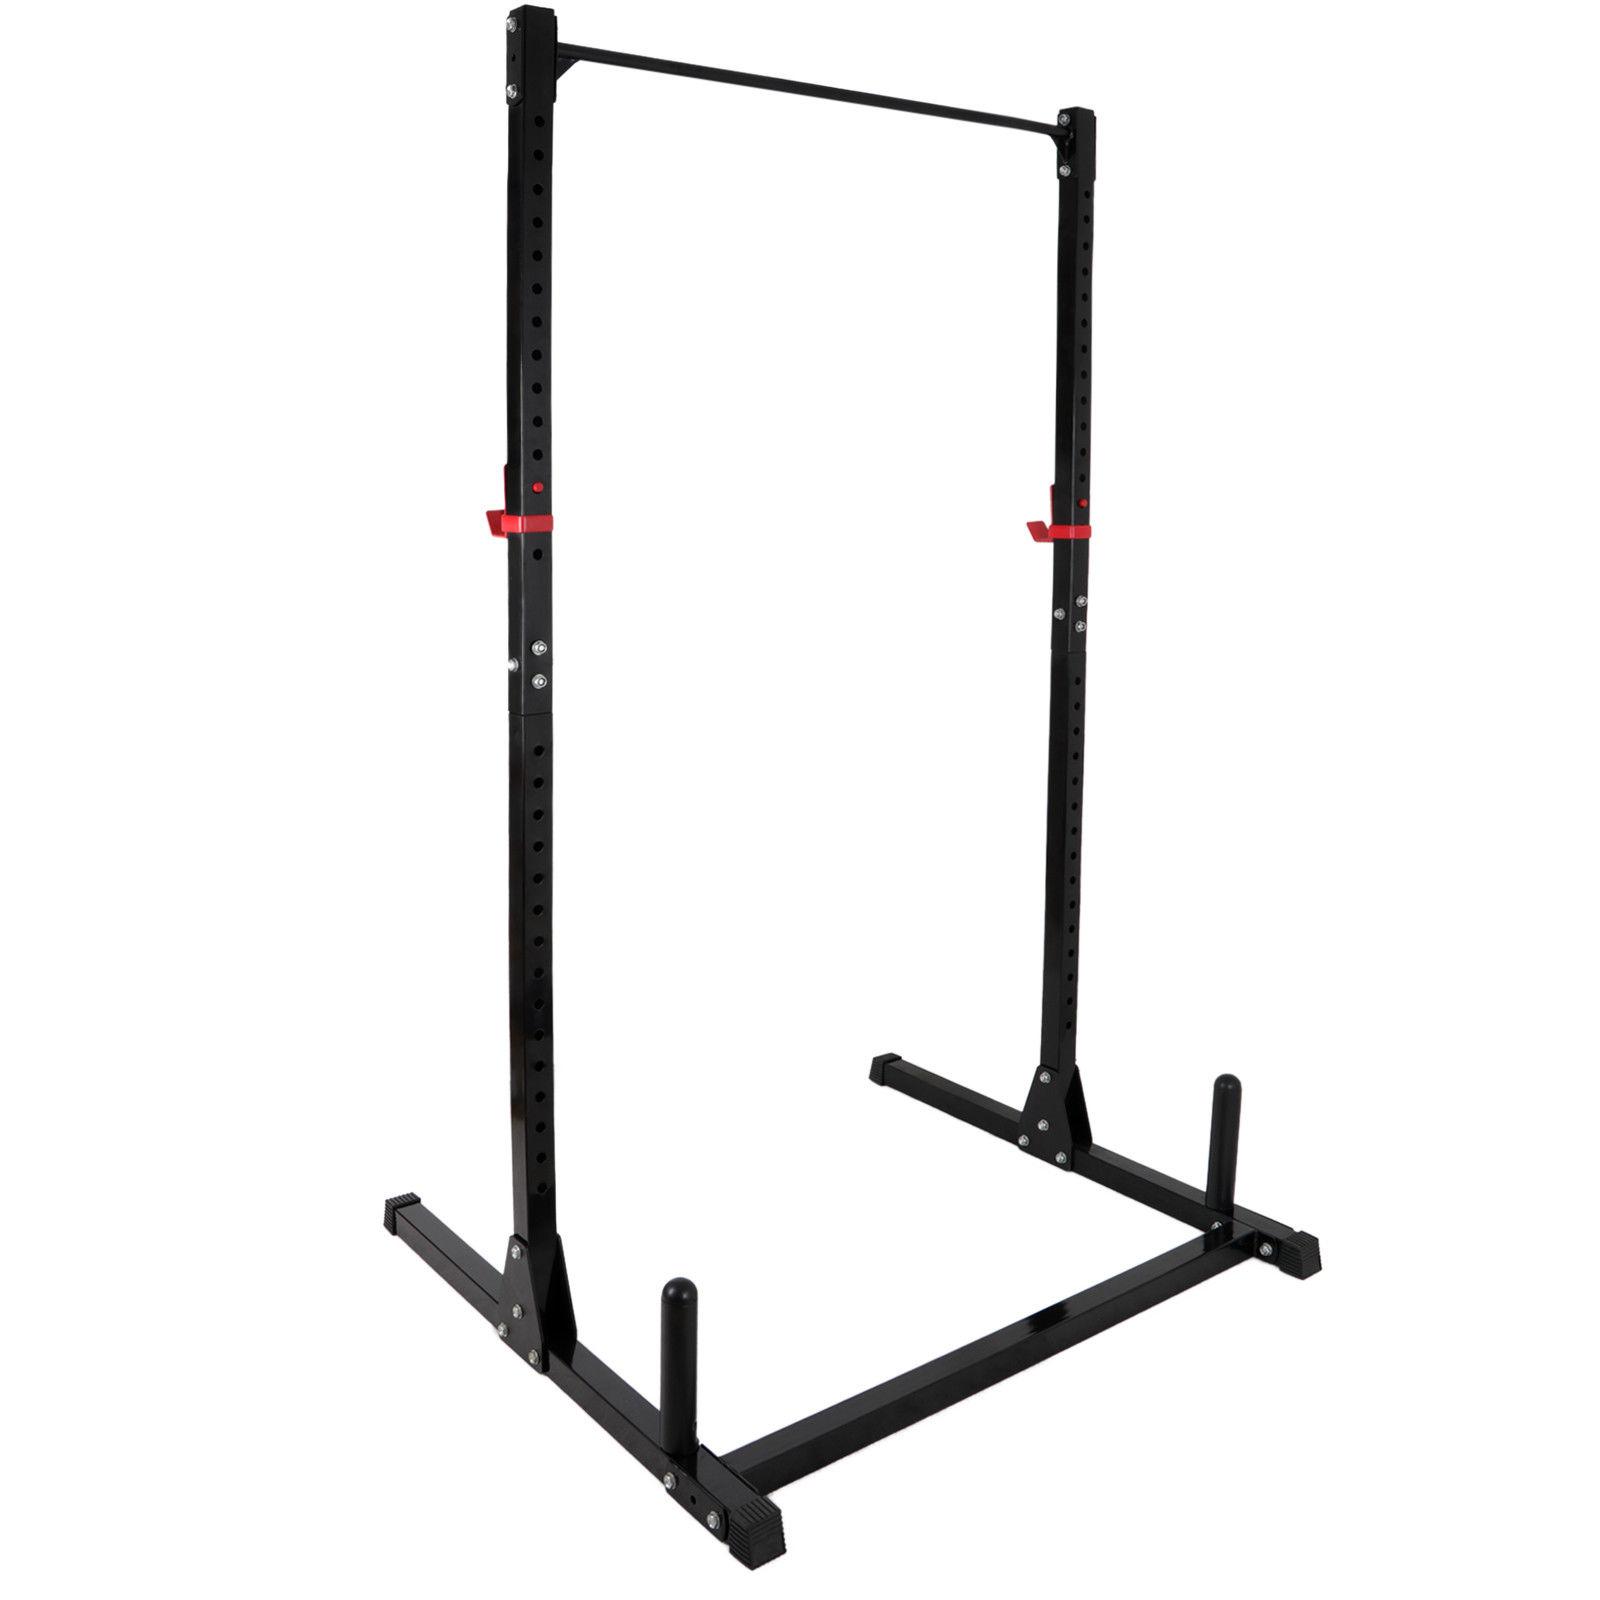 zenstyle exercising fitness workout gym power rack strengthening equipment ergonomic tool indoor bearing 550lb black